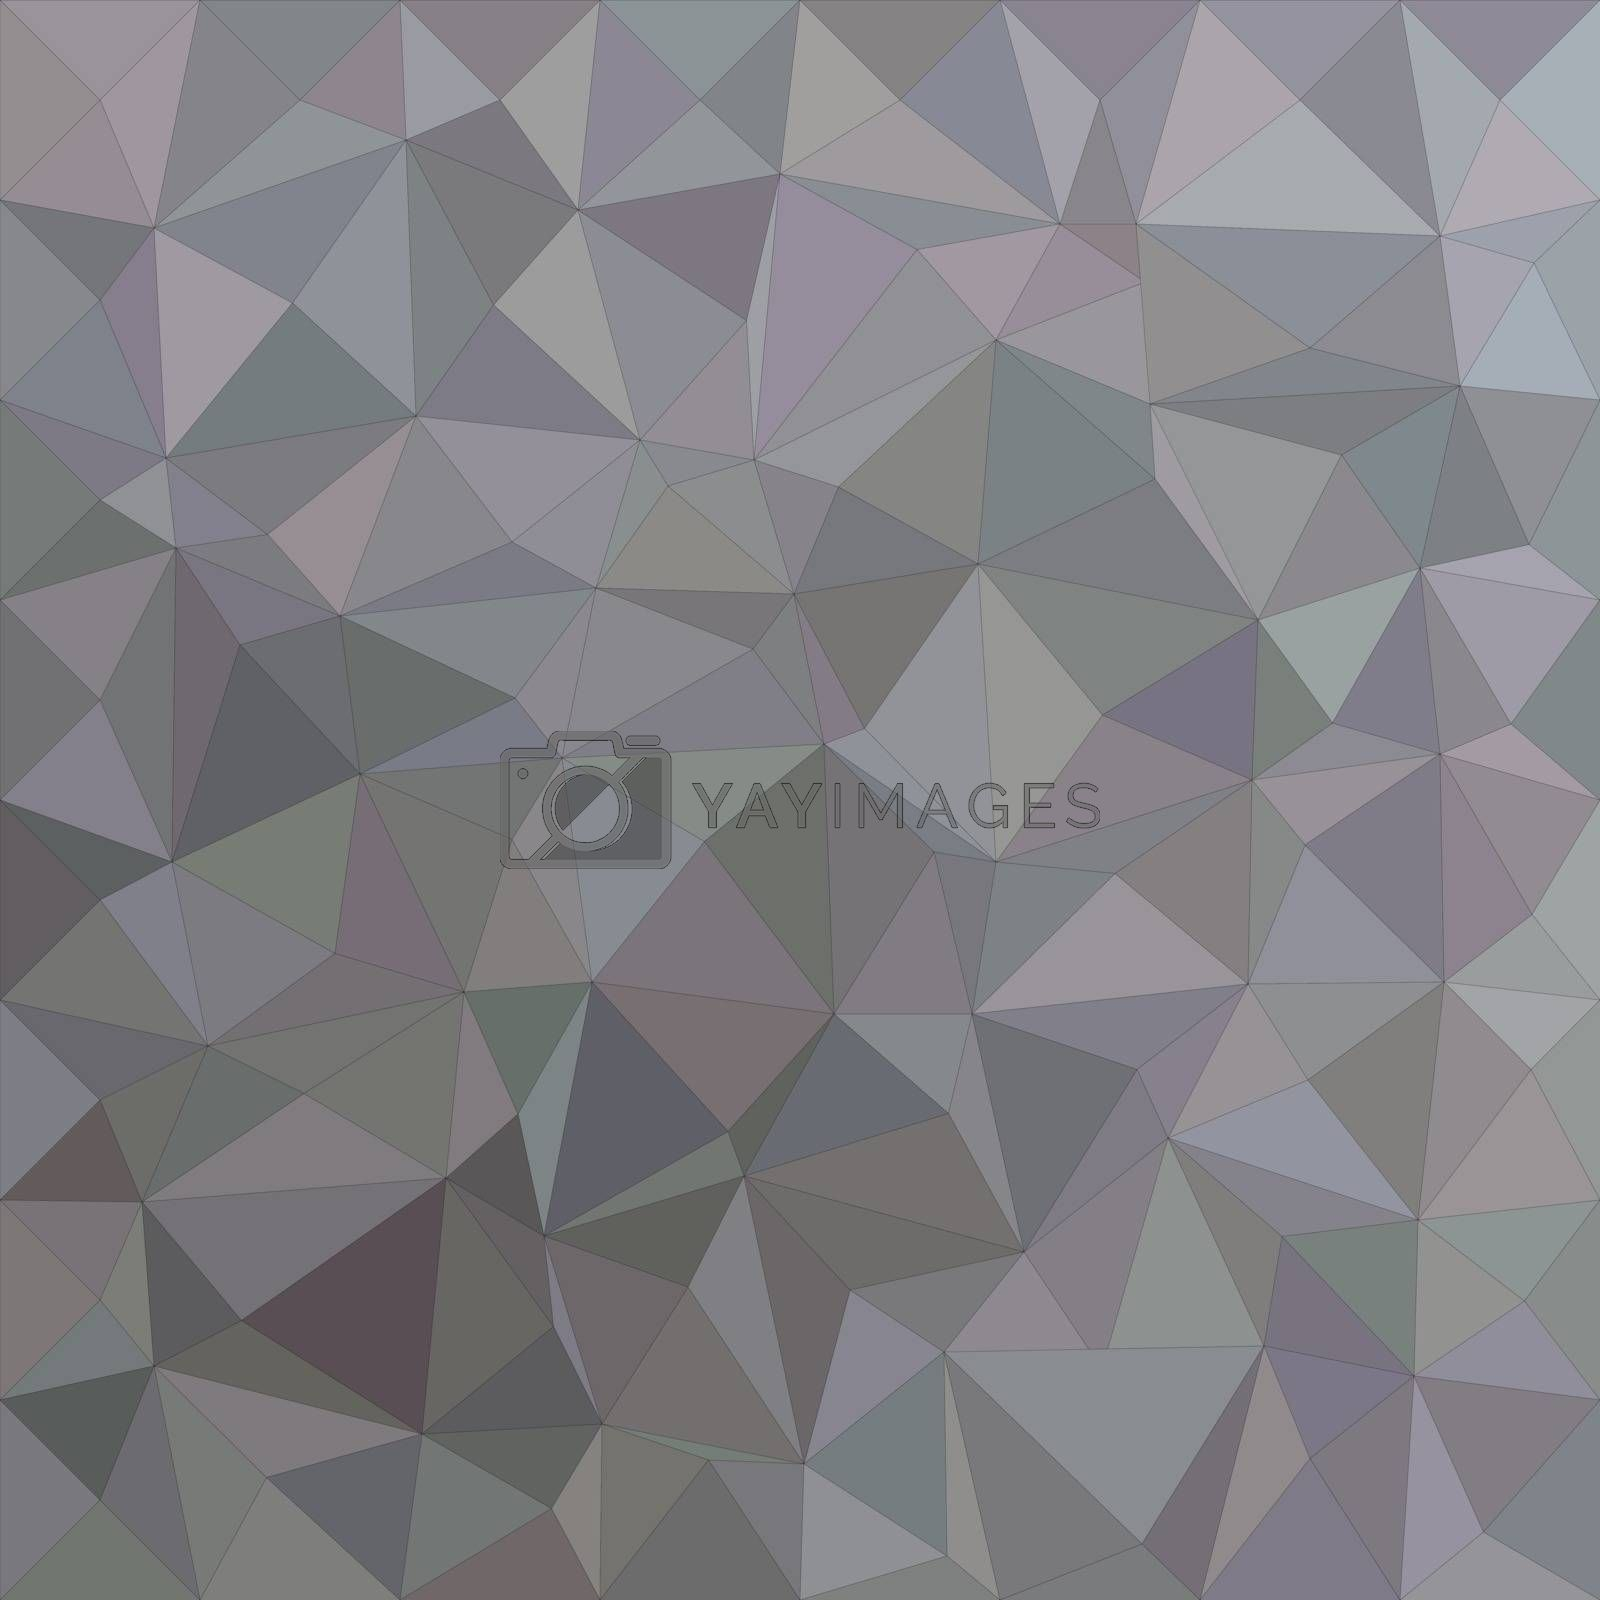 Grey irregular triangle mosaic vector background design